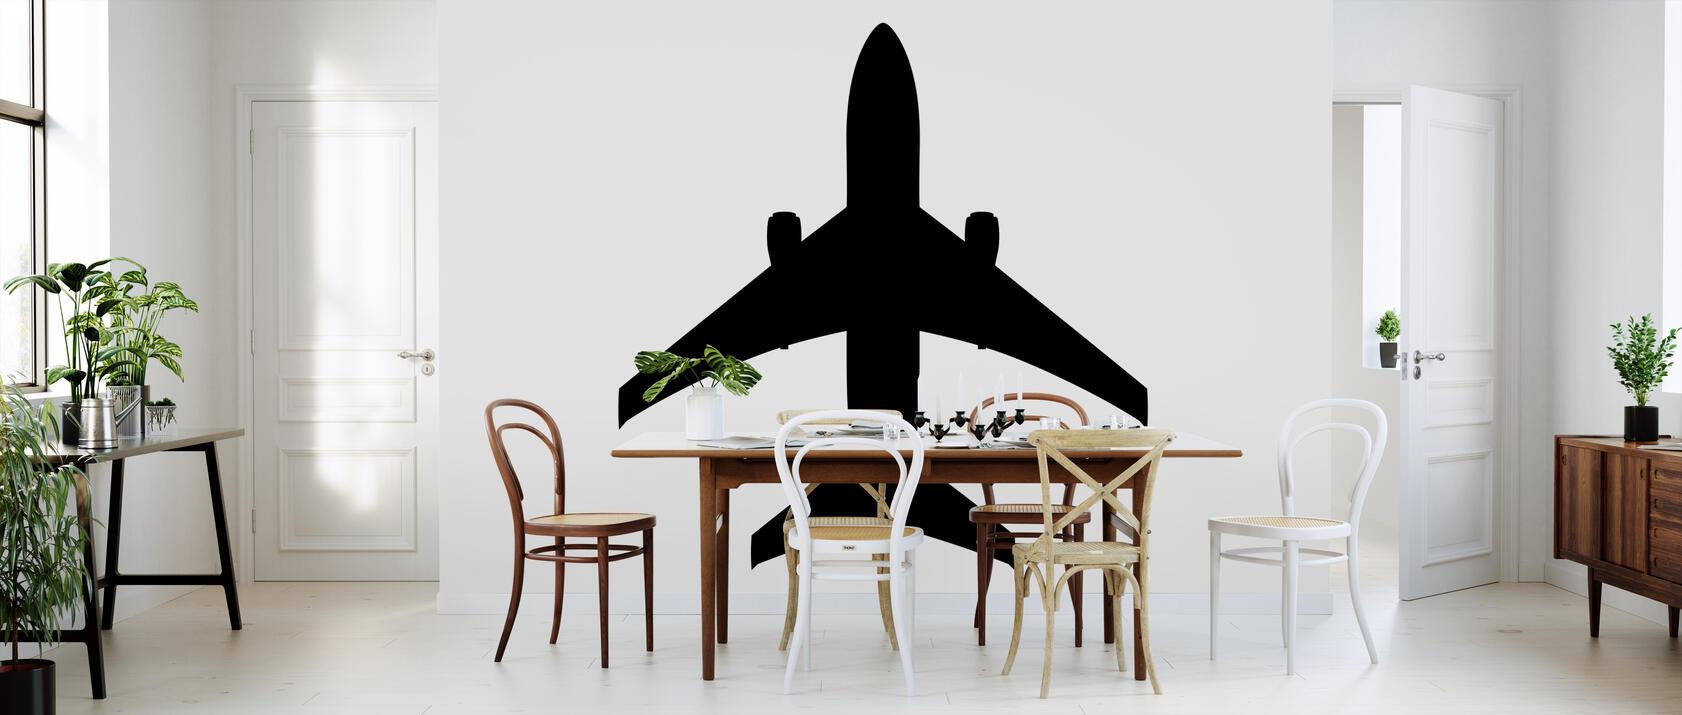 graphic plane fototapete nach ma photowall. Black Bedroom Furniture Sets. Home Design Ideas